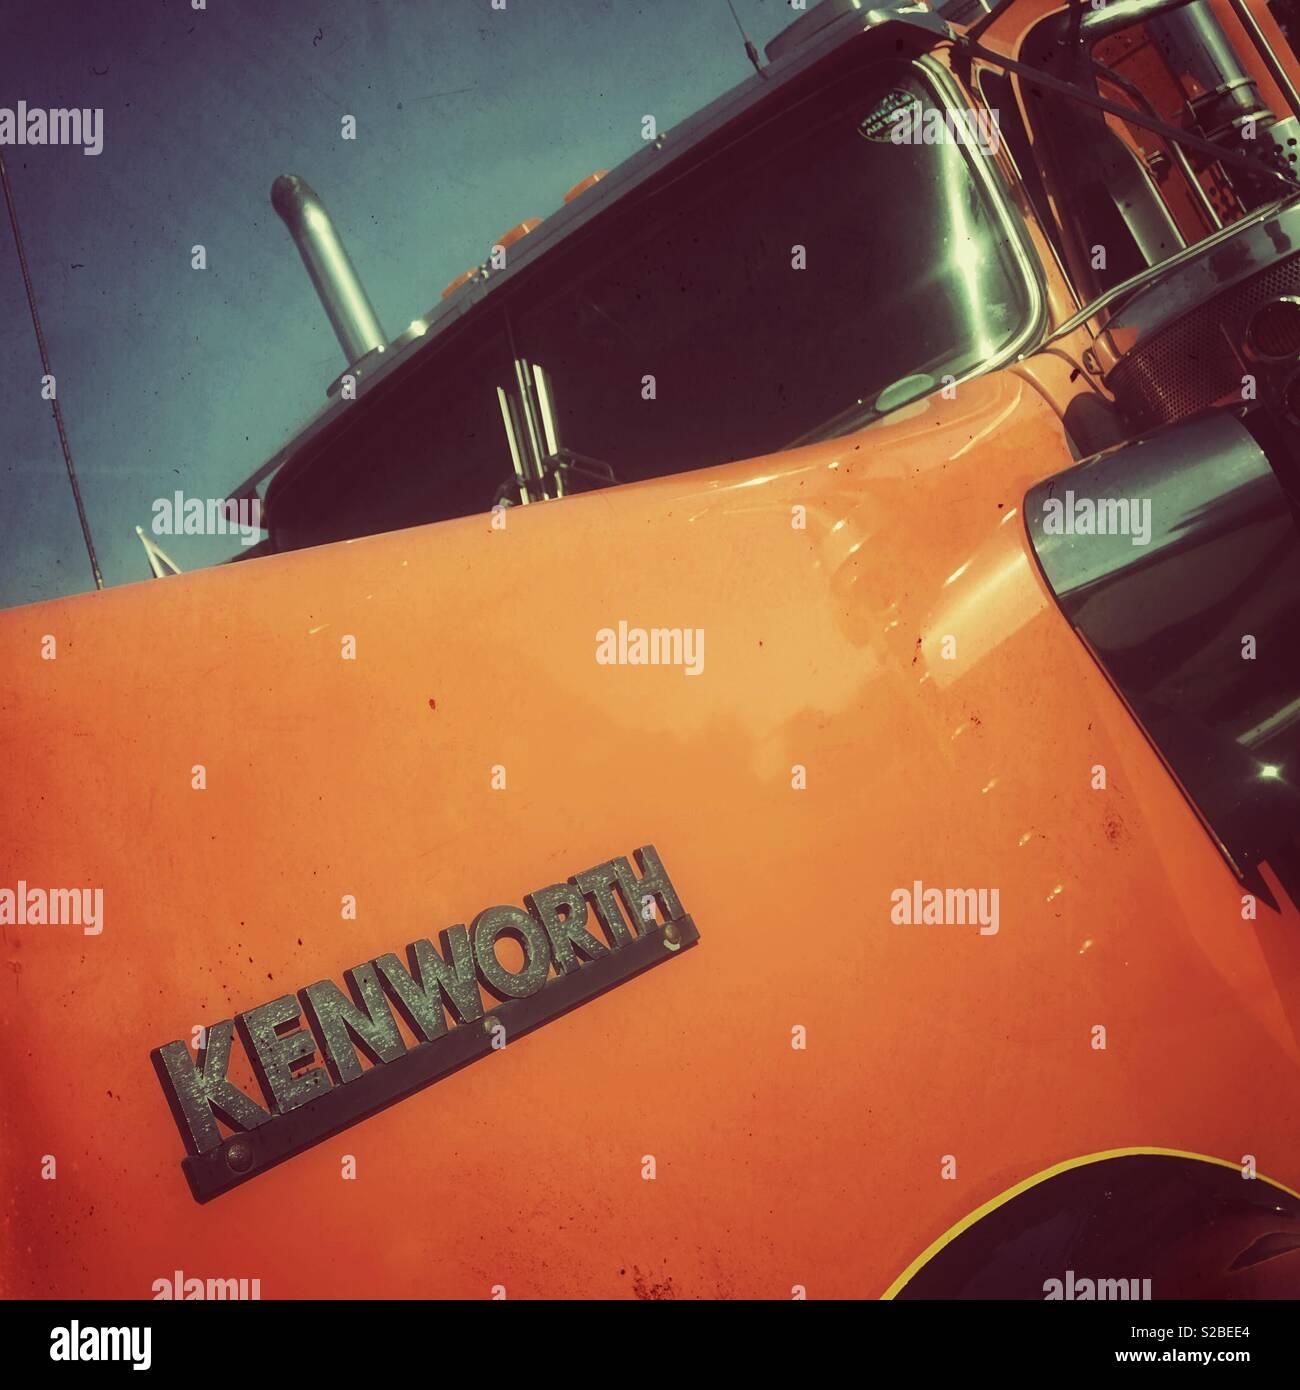 1970s era Kenworth semi truck cab an American design - Stock Image